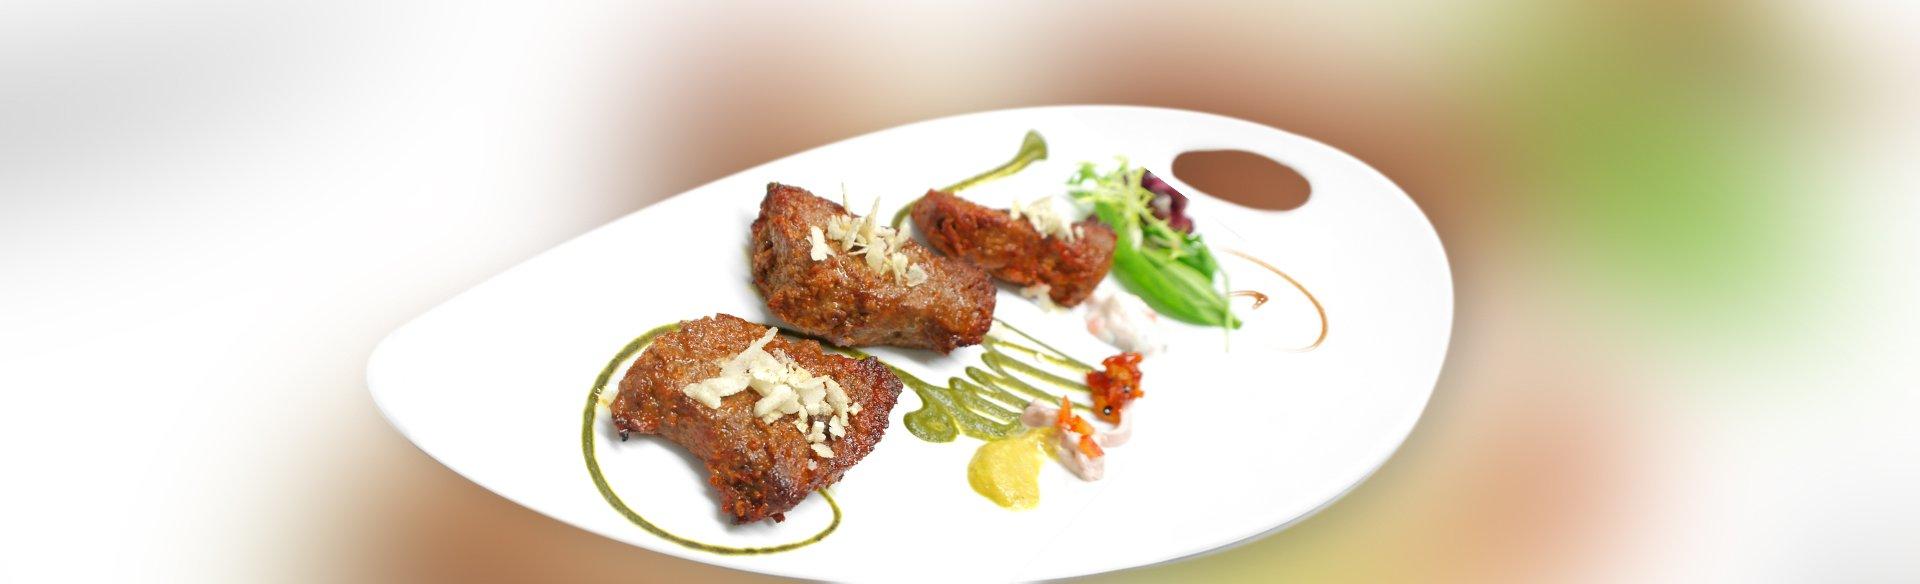 Food Banner - The 29029 Restaurant Broadstone